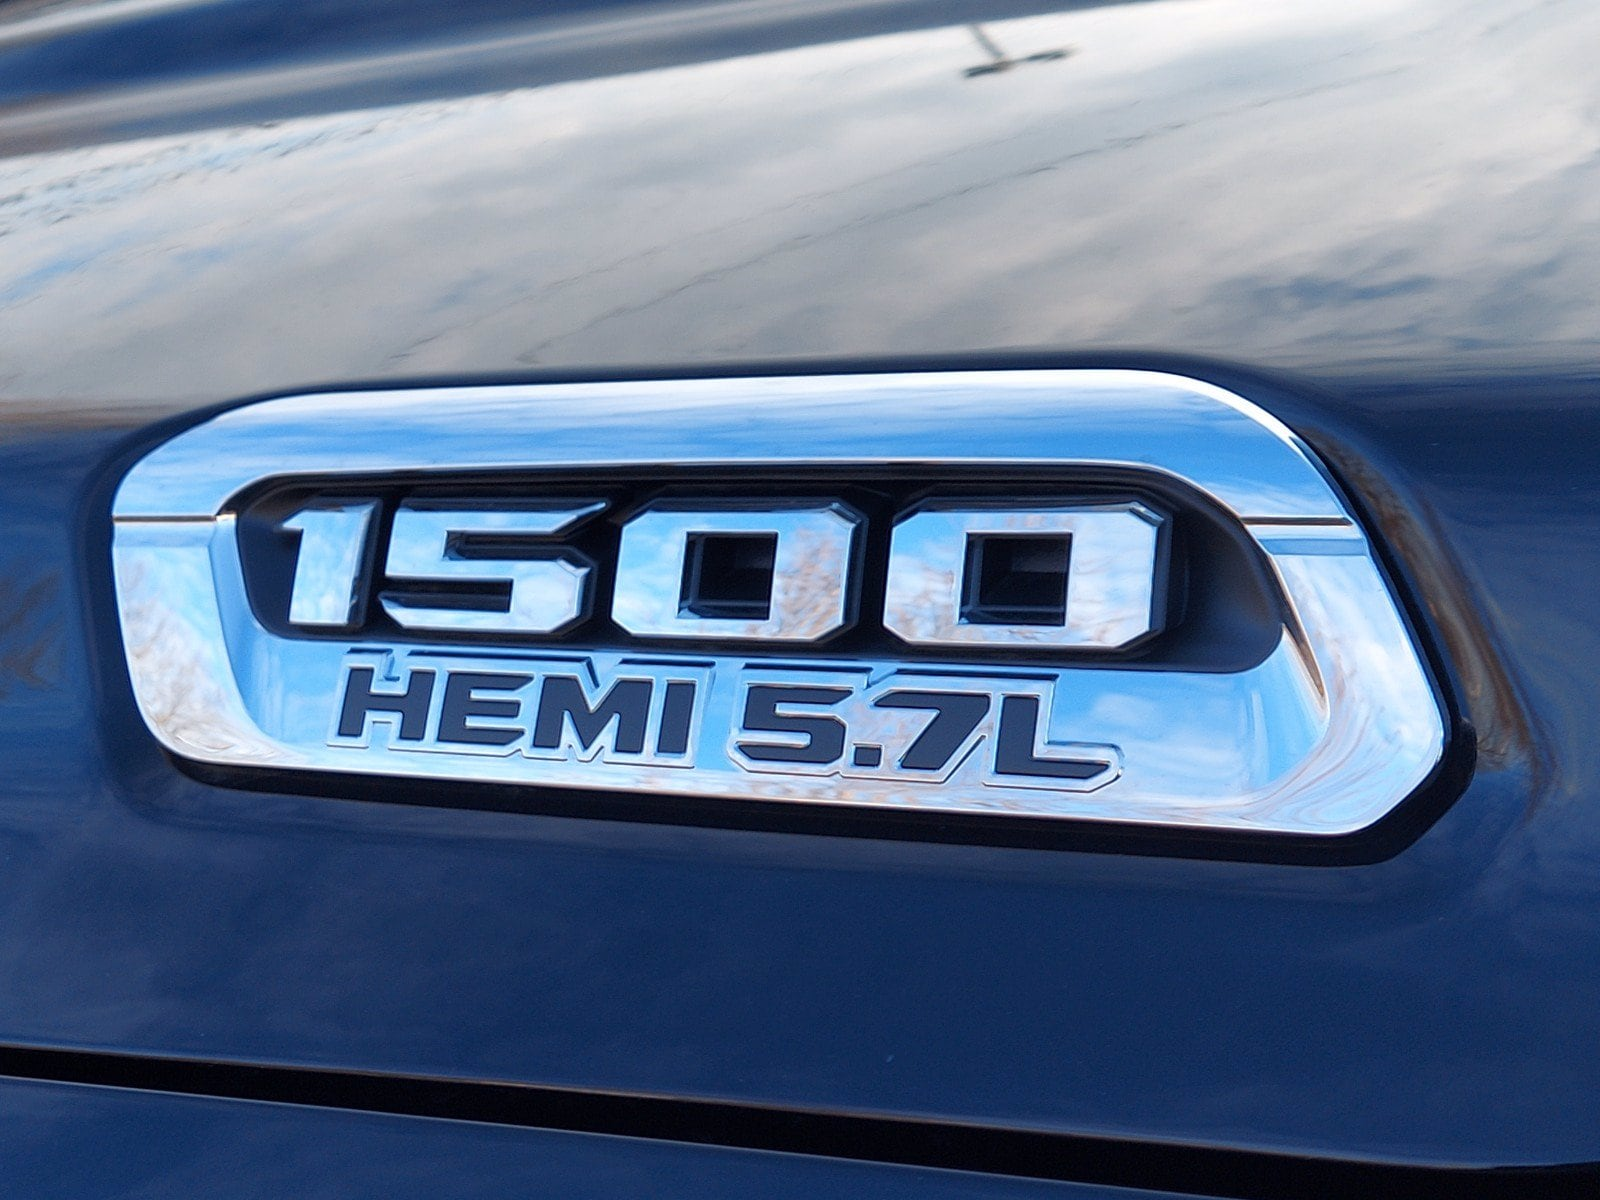 2021 Ram 1500 Quad Cab 4x2, Pickup #CM119 - photo 9